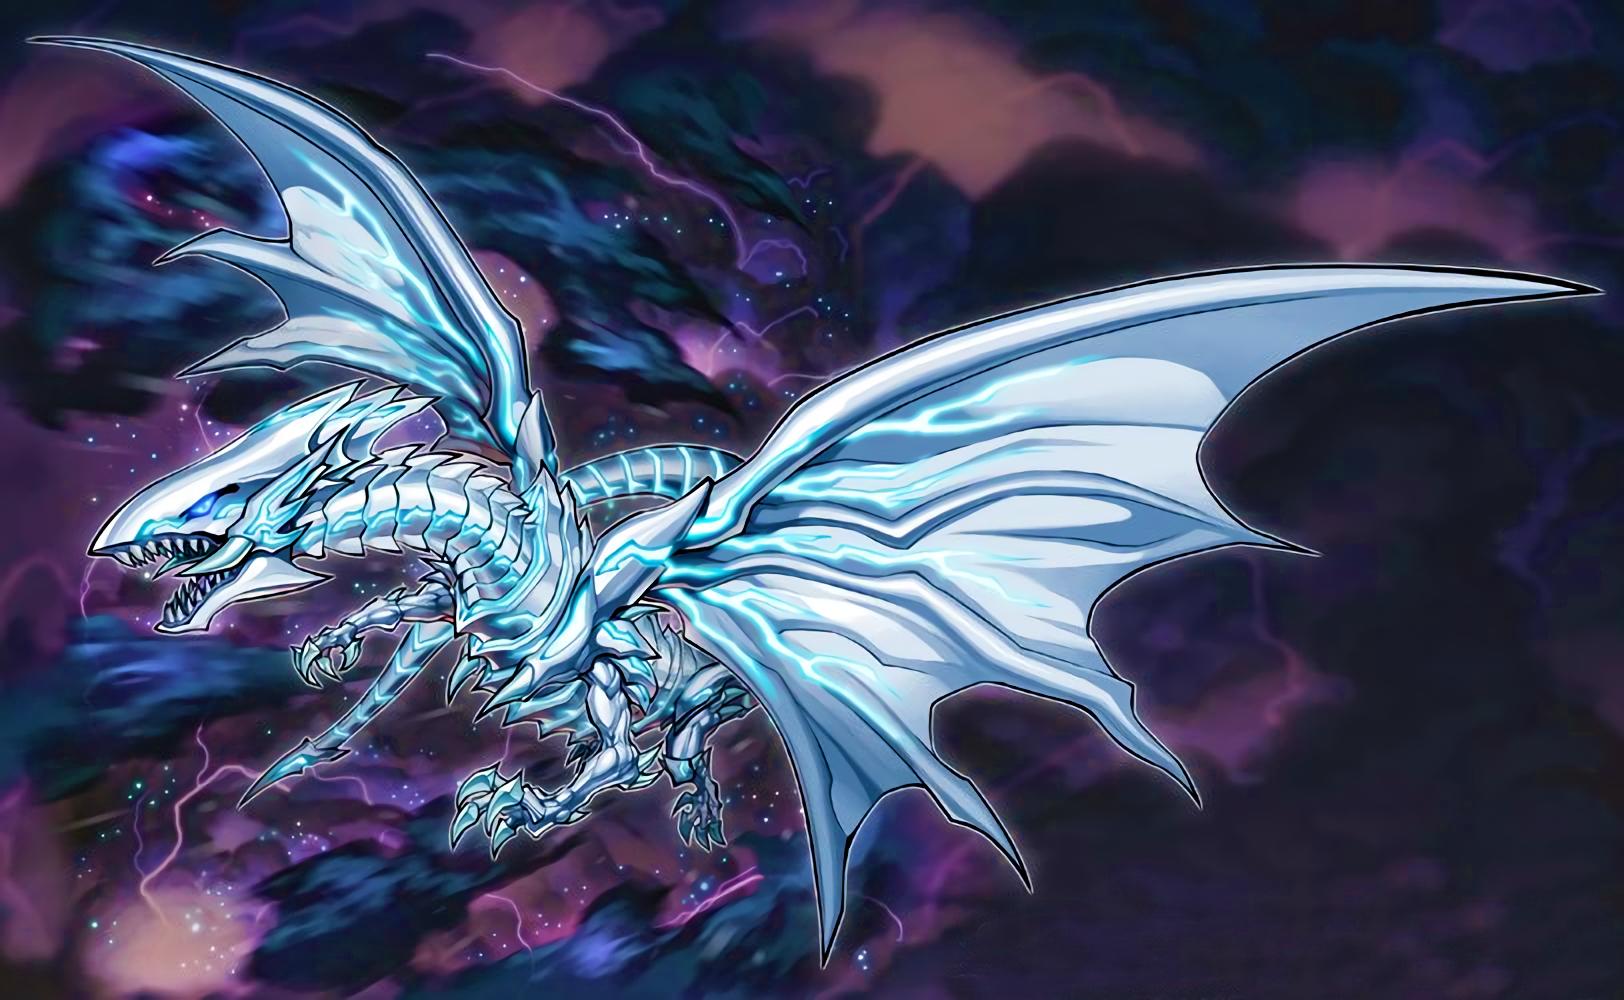 Blueeyes Alternative White Dragon Artwork By Alanmac95 On Deviantart